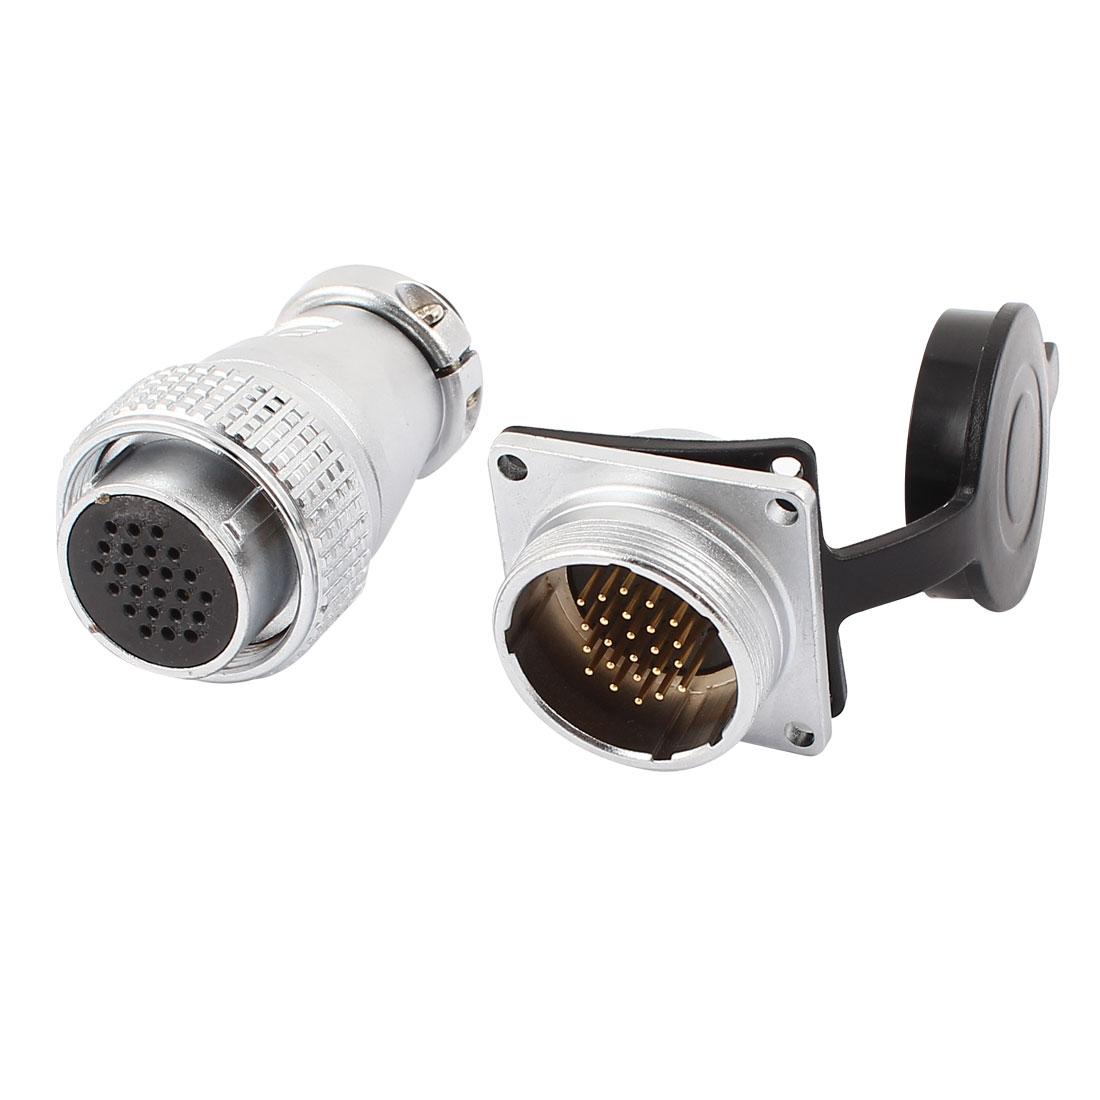 AC500V 10A 30mm Threaded Dia 24Pins Aviation Connector Socket